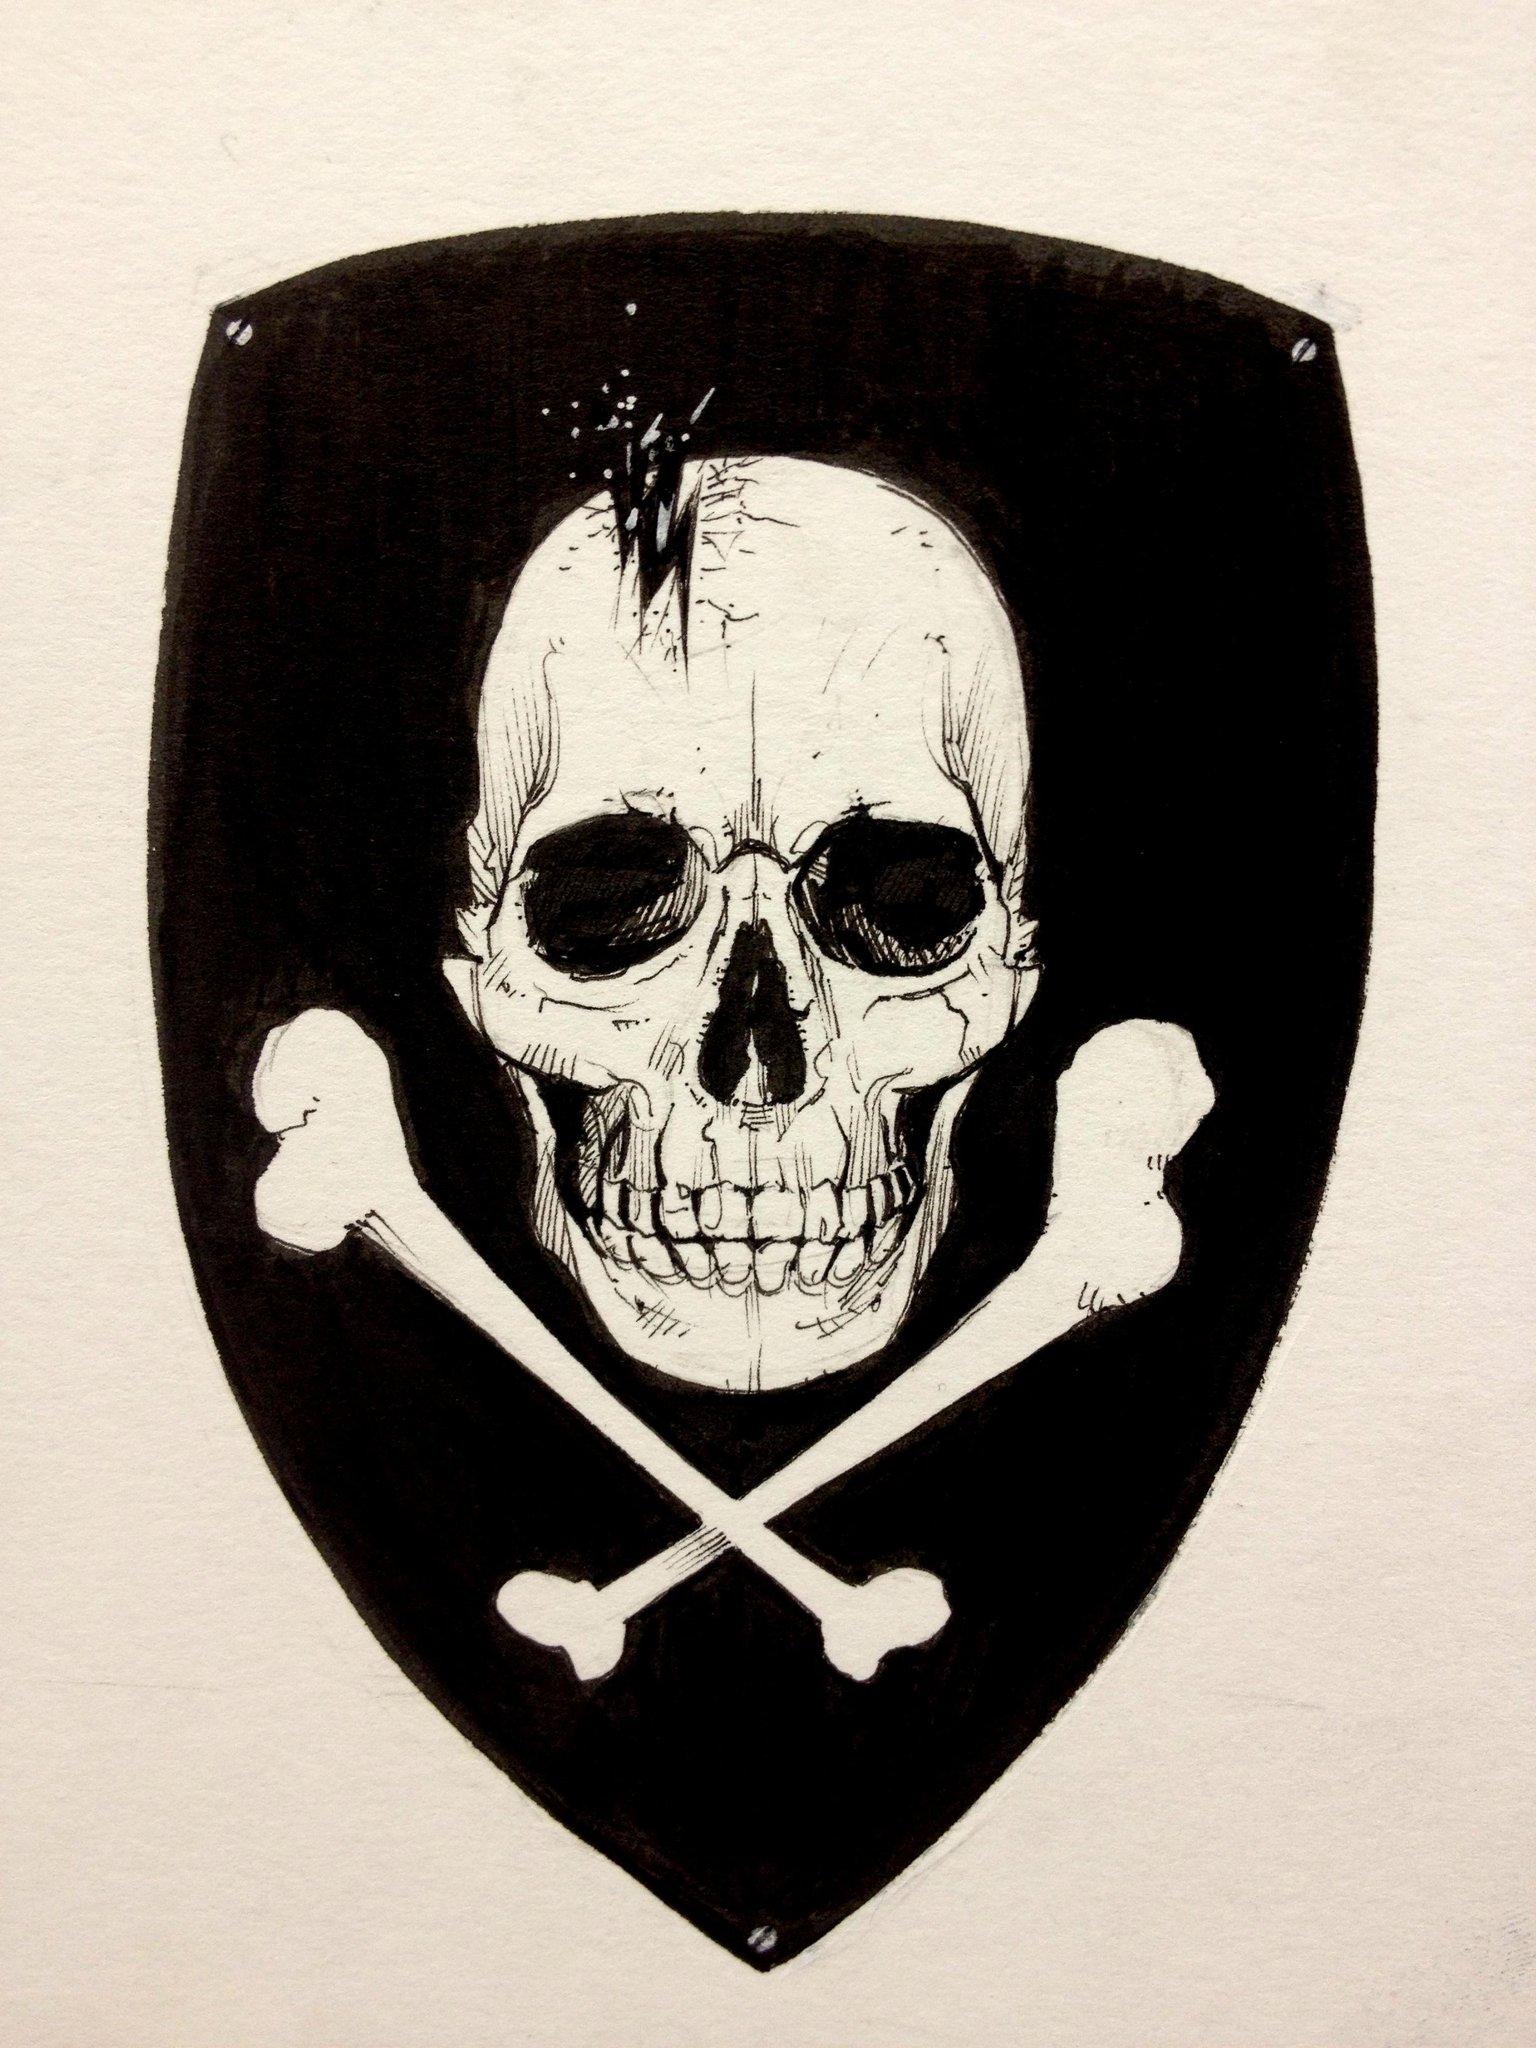 Skull badge I drew for an RC airplane. http://t.co/bGzdIaEh